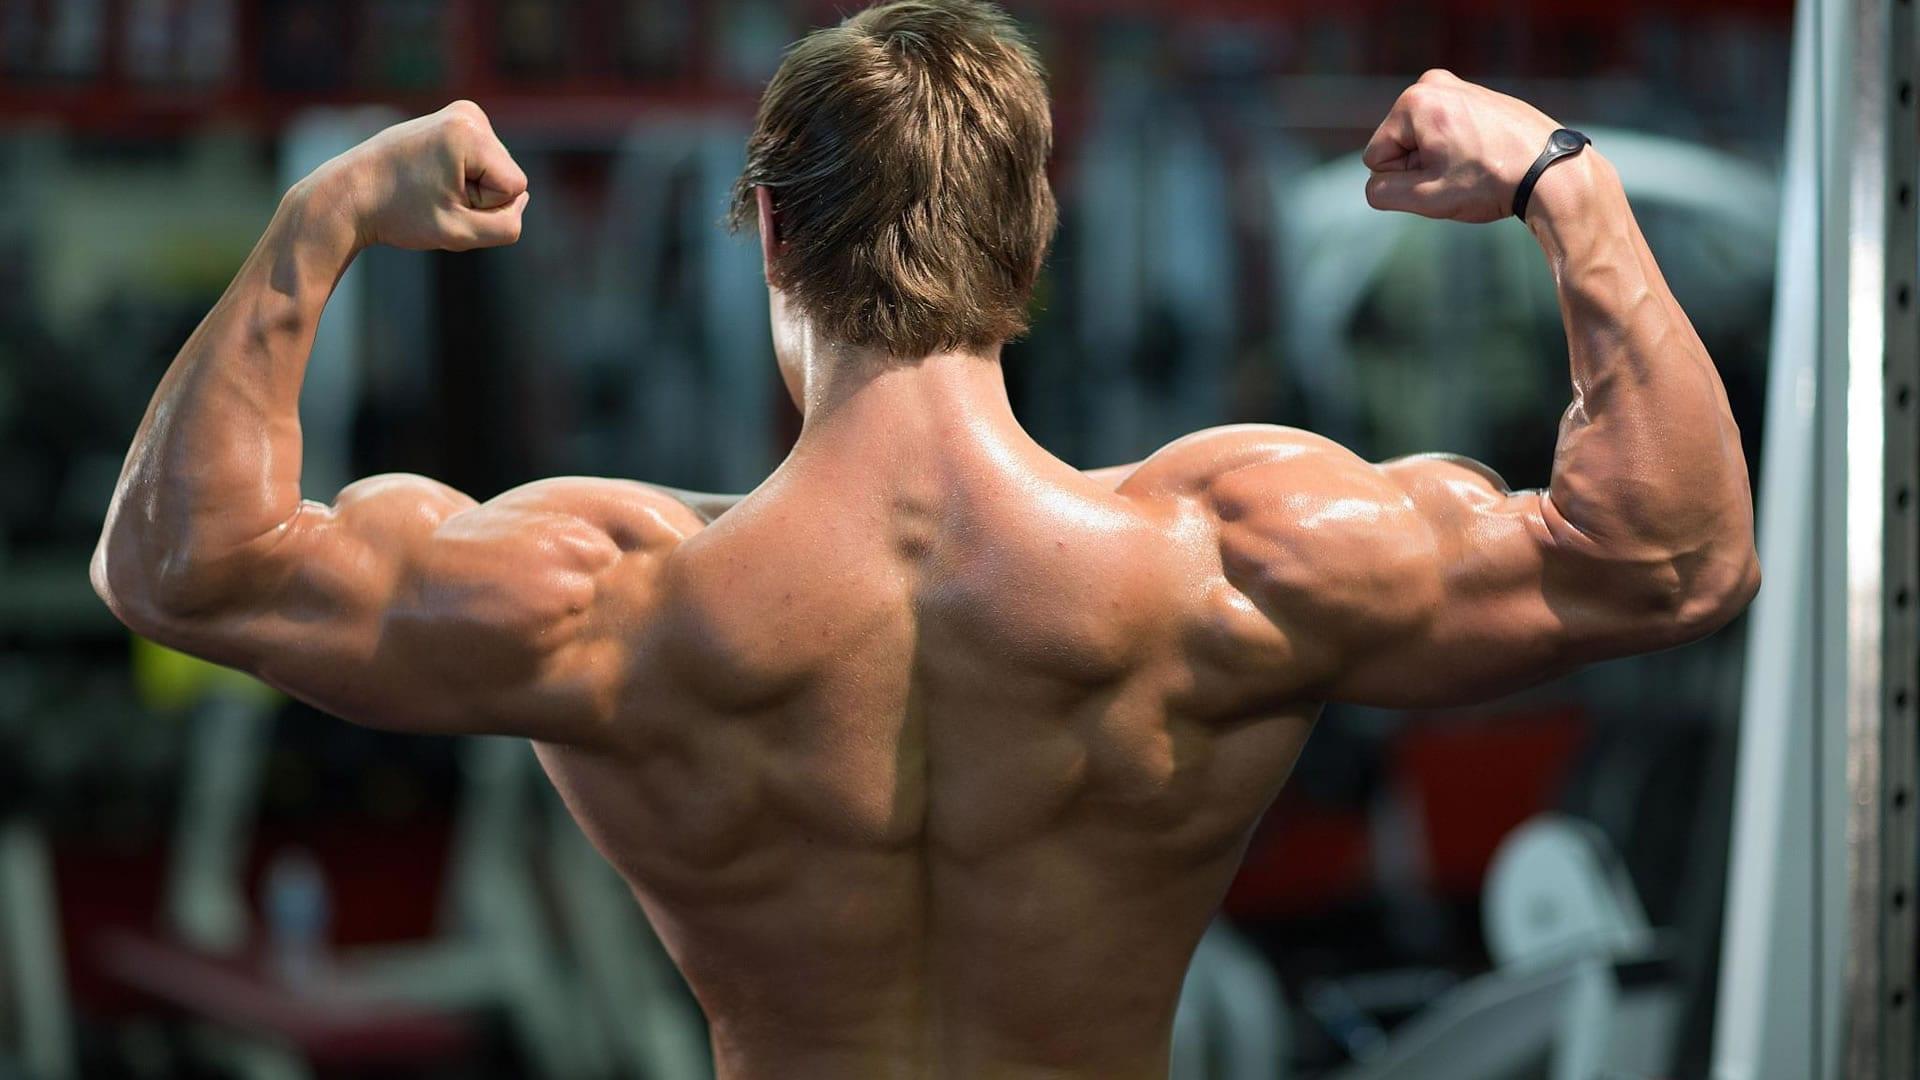 arnold schwarzenegger bodybuilding wallpaper hd